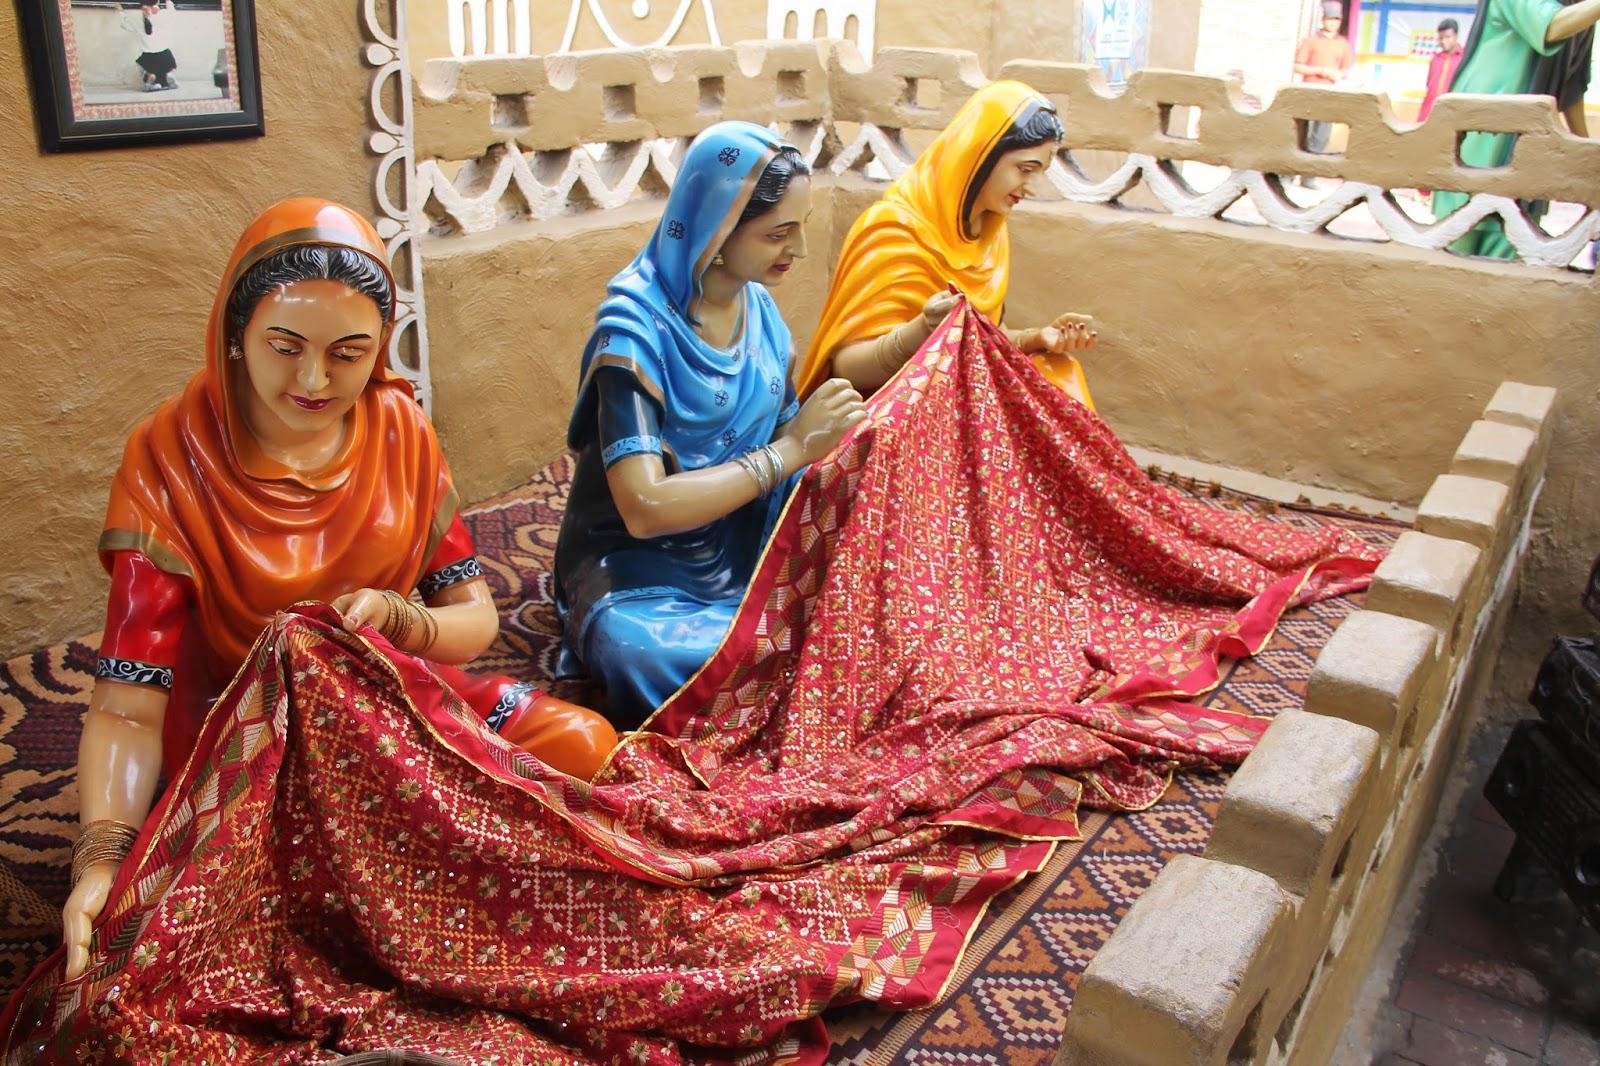 punjabi culture haveli punjab phulkari rangla restaurant glimpse wallpapers well dupatta personality into sikh heritage colorful delight depicted attire visual